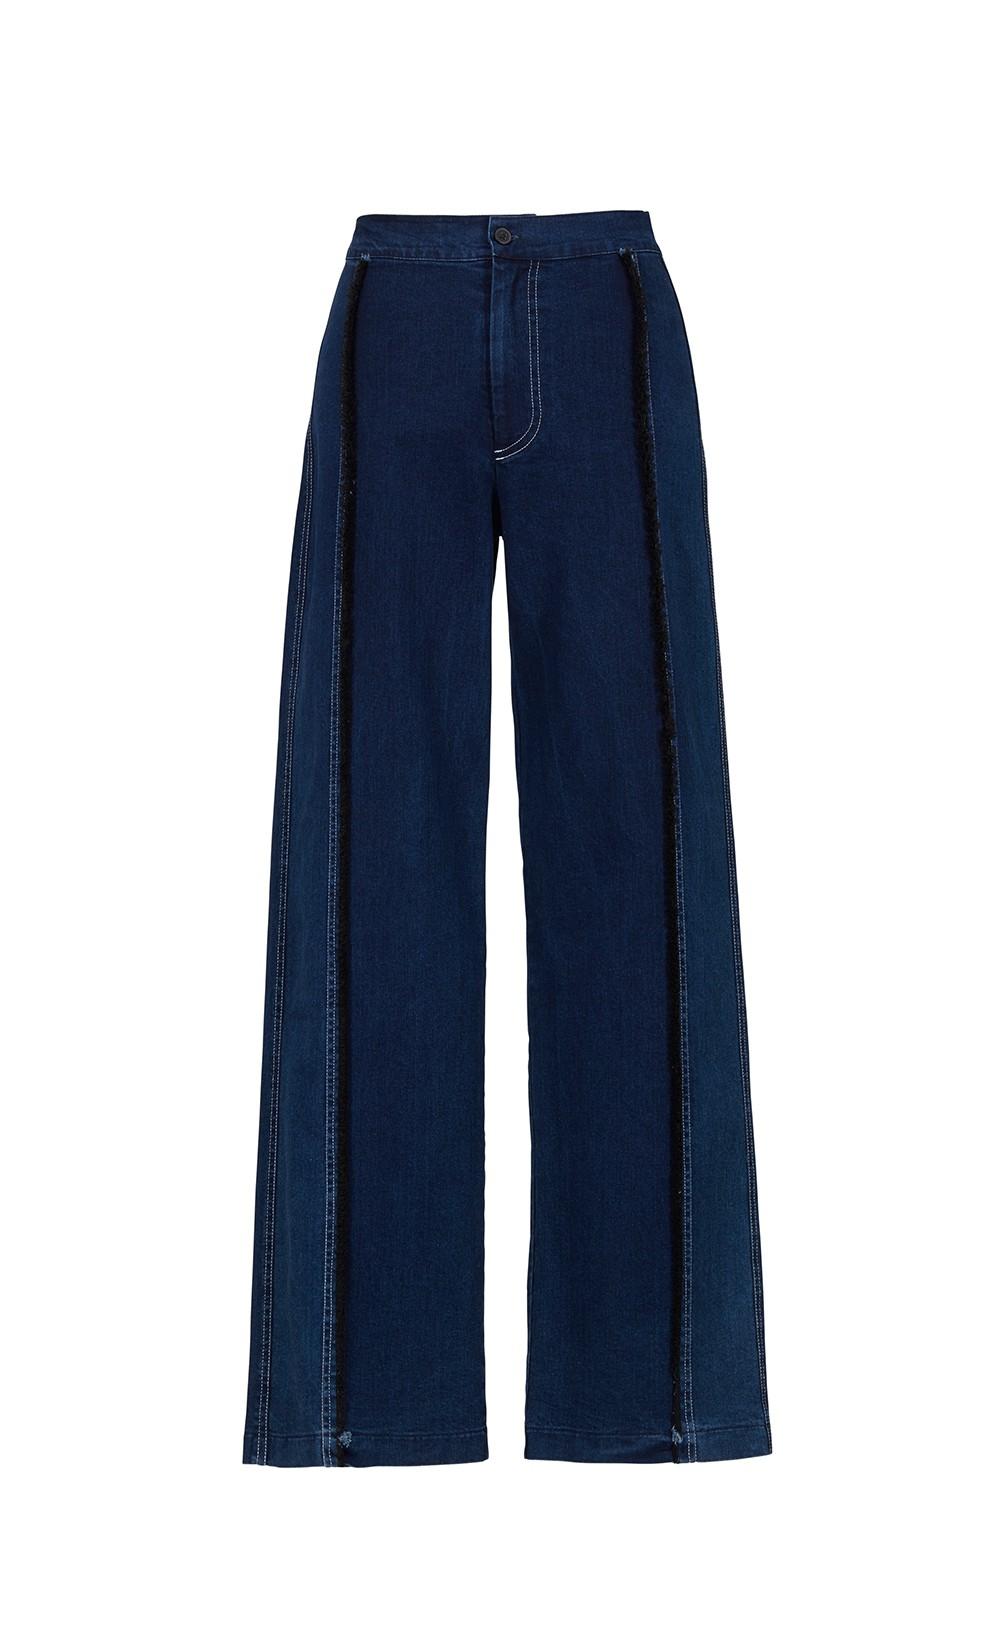 Bolyn Jeans